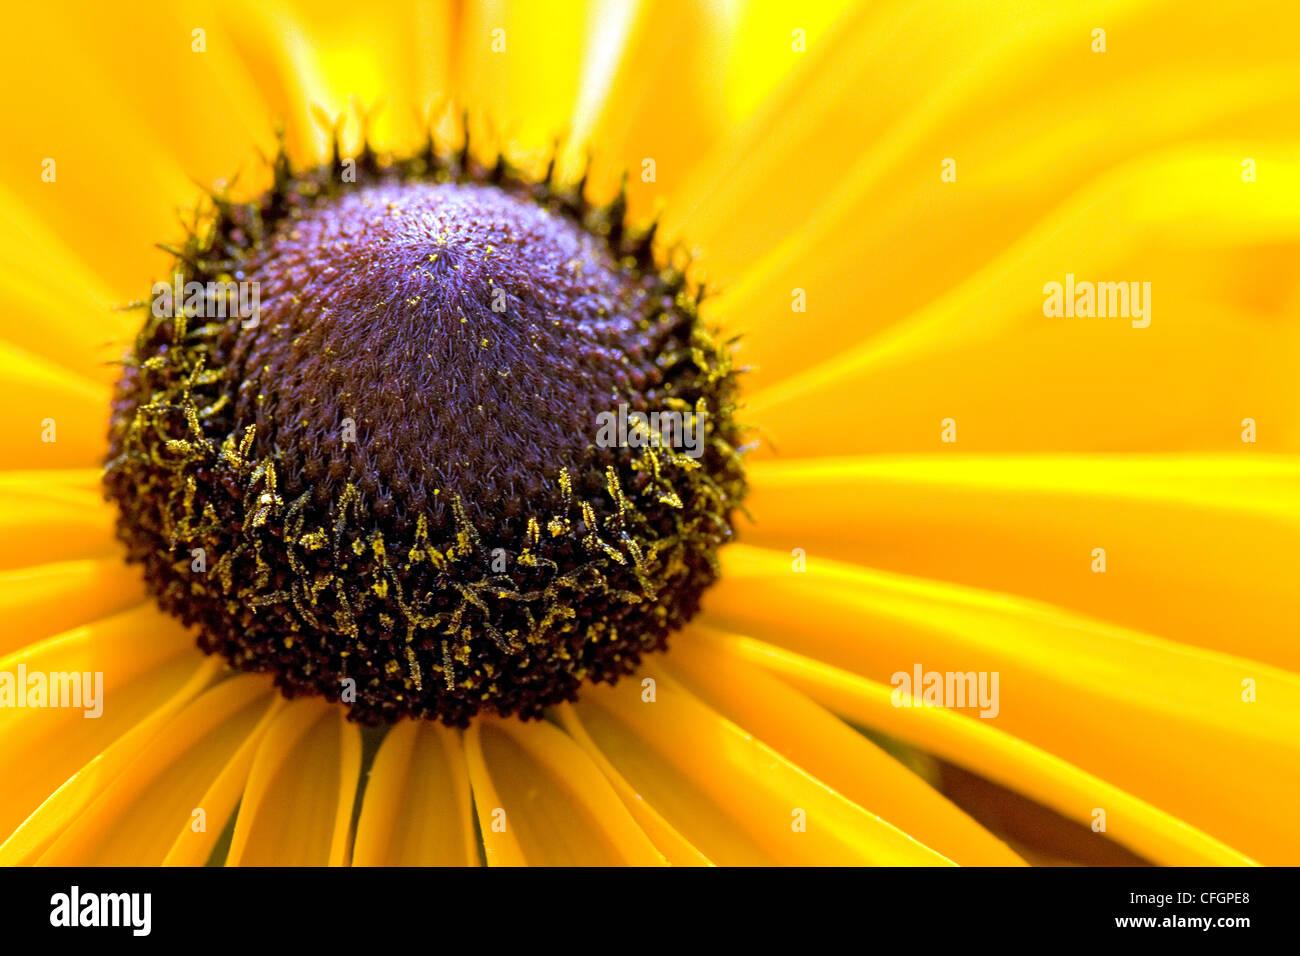 Close up shot of yellow flower's pistil Stock Photo